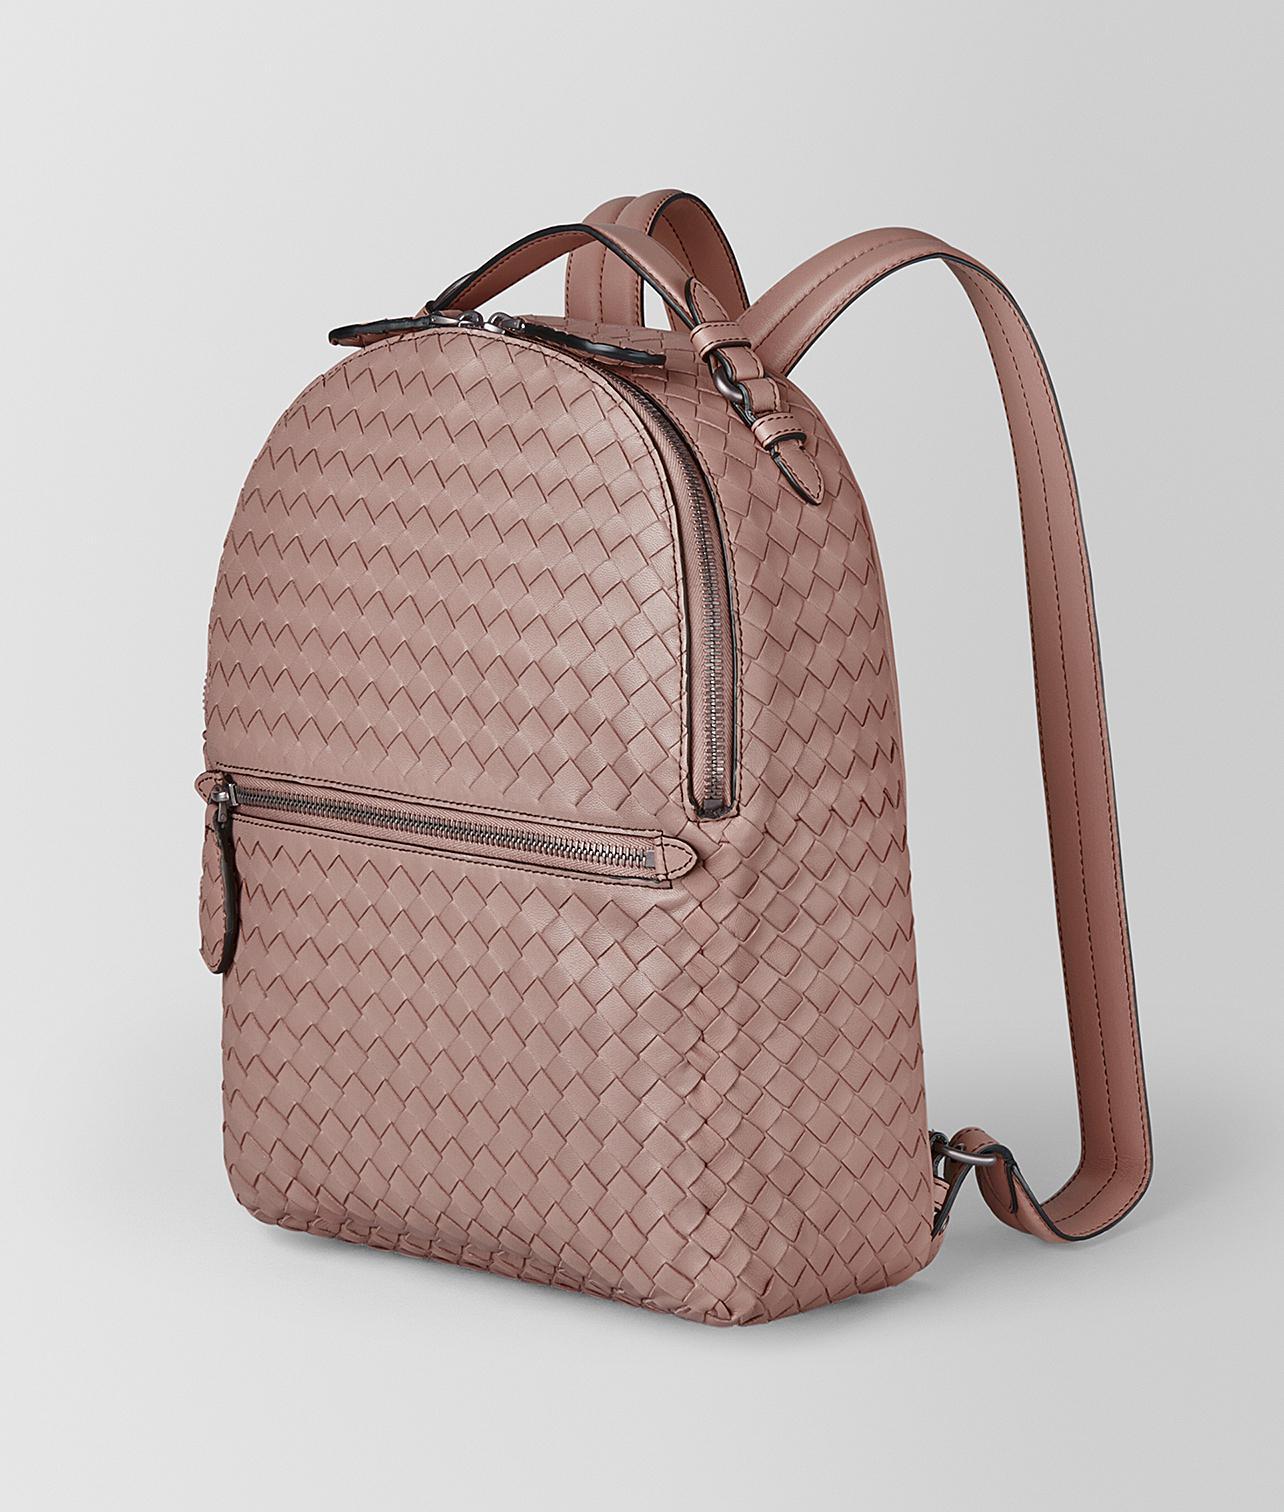 Lyst - Bottega Veneta Backpack 5fa5bc77955d2